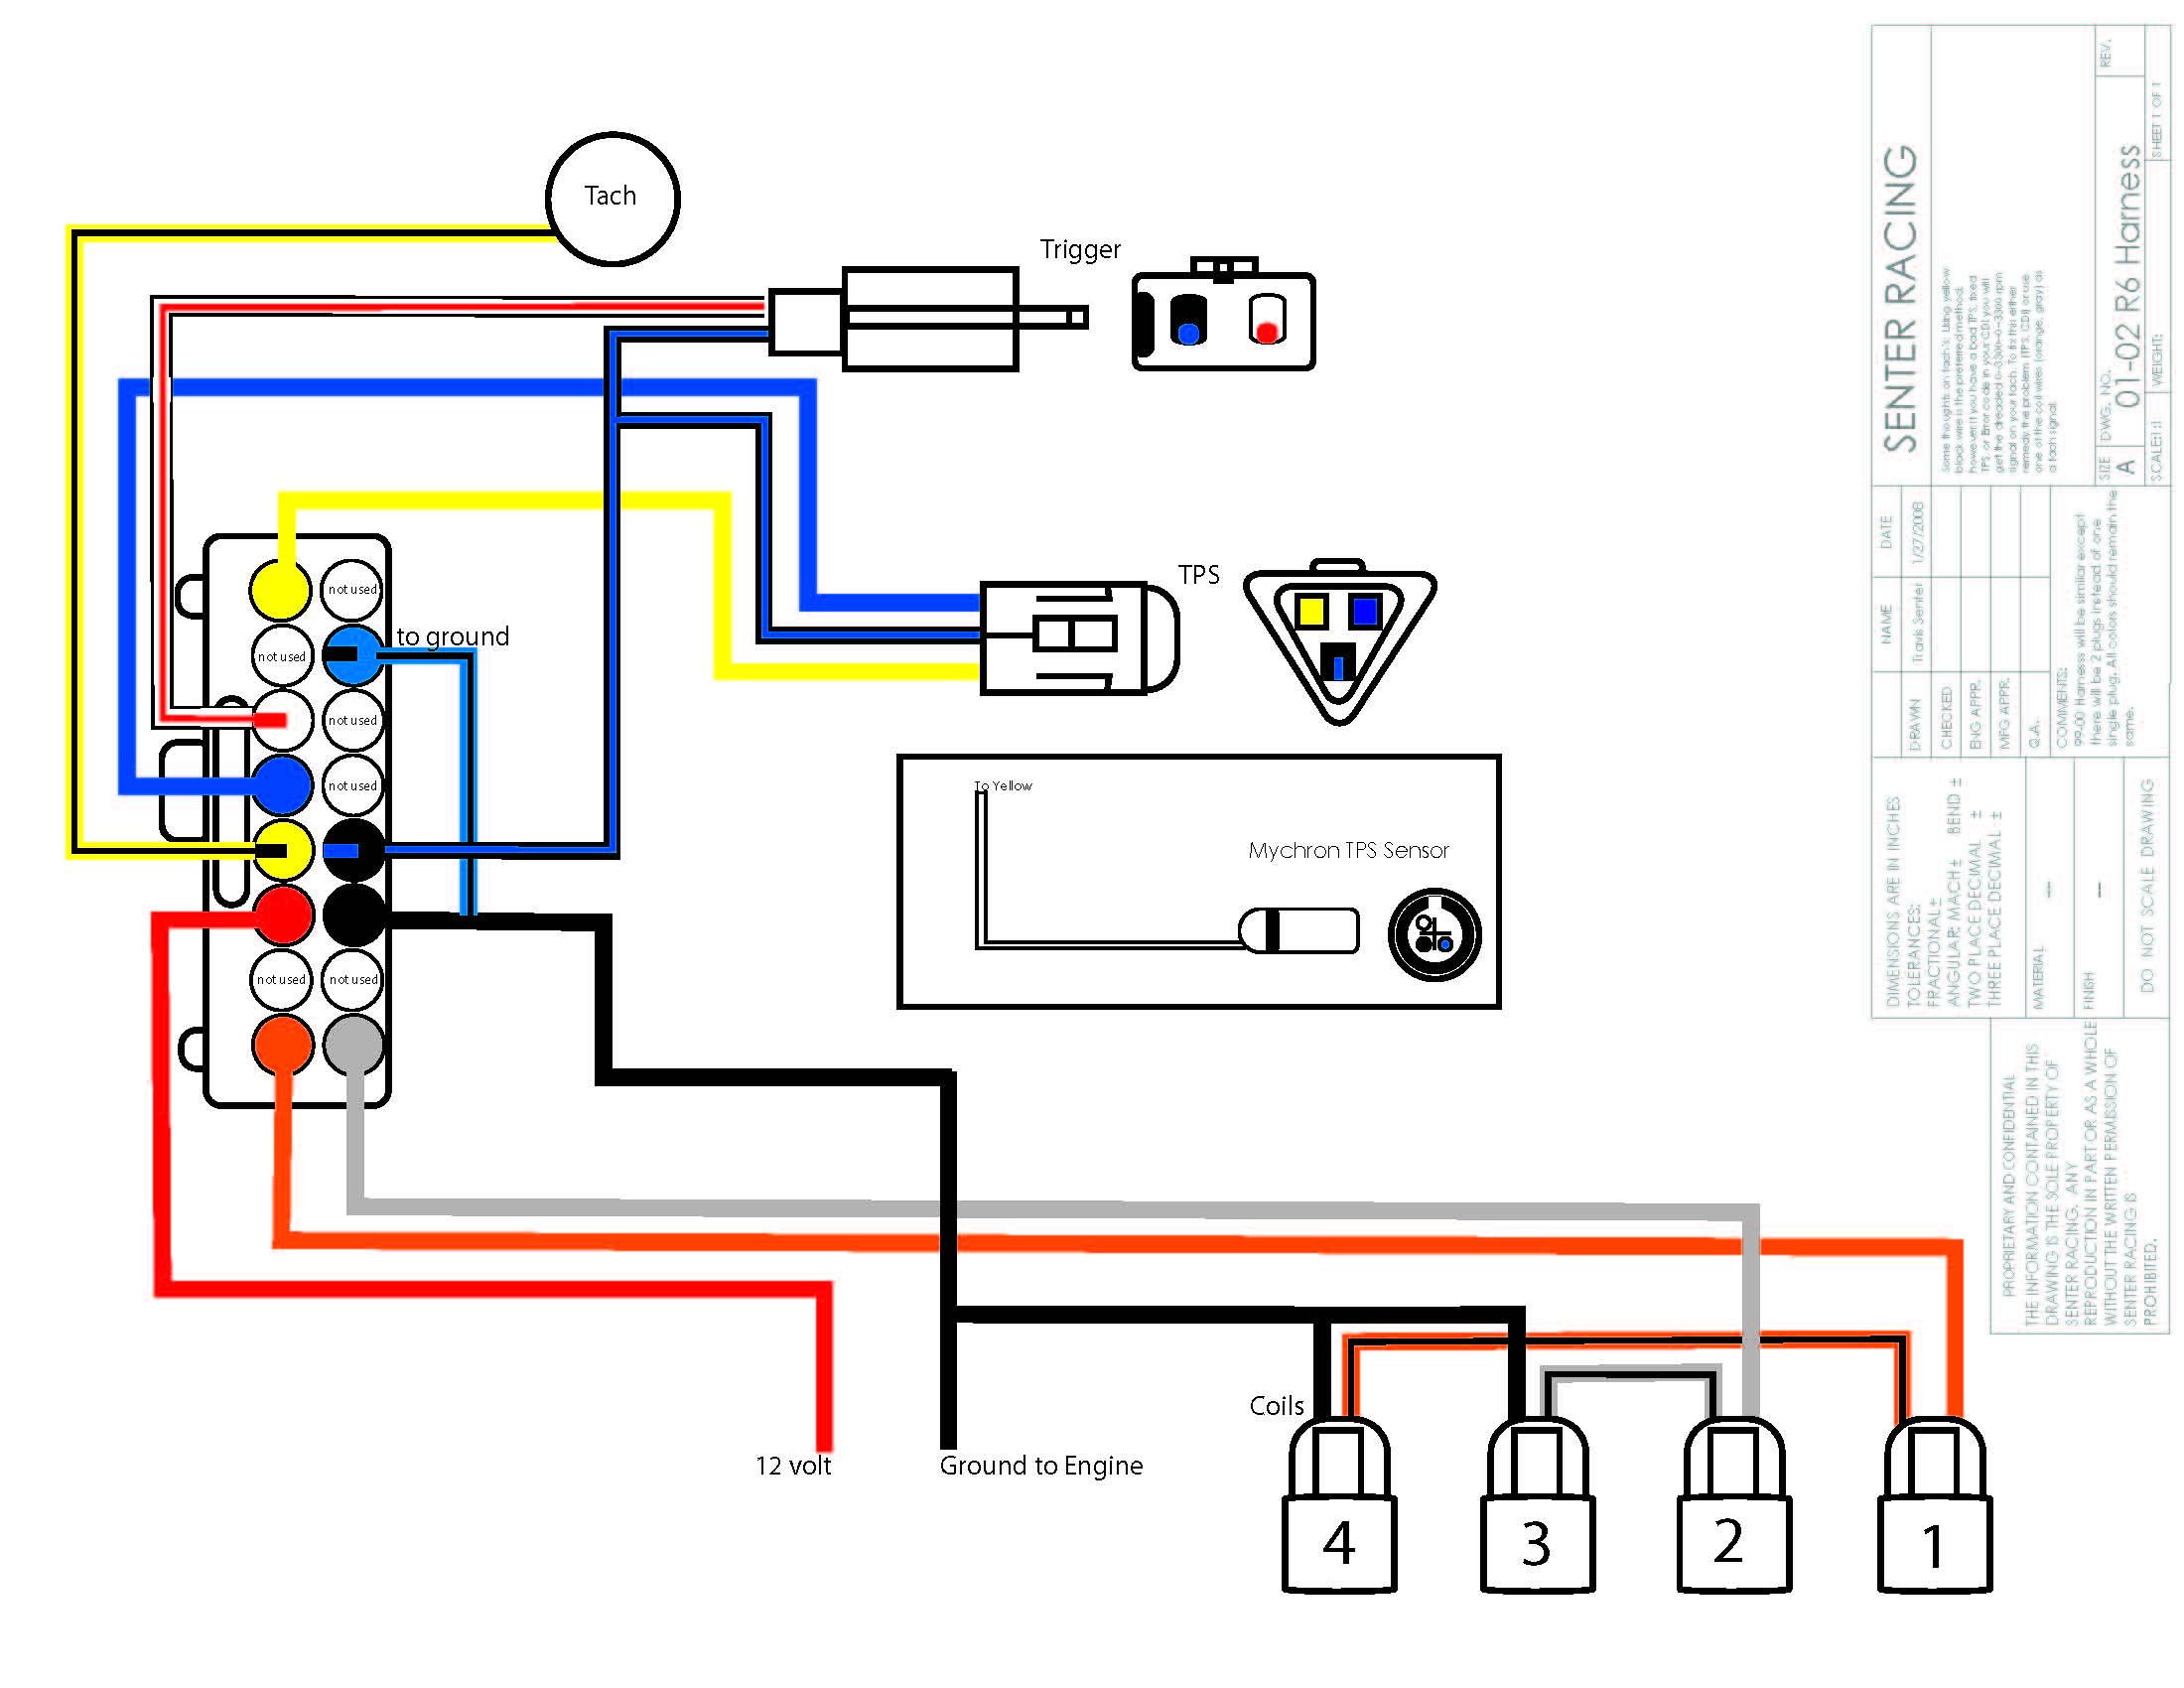 cal spa wiring diagram volvo semi truck engine diagrams